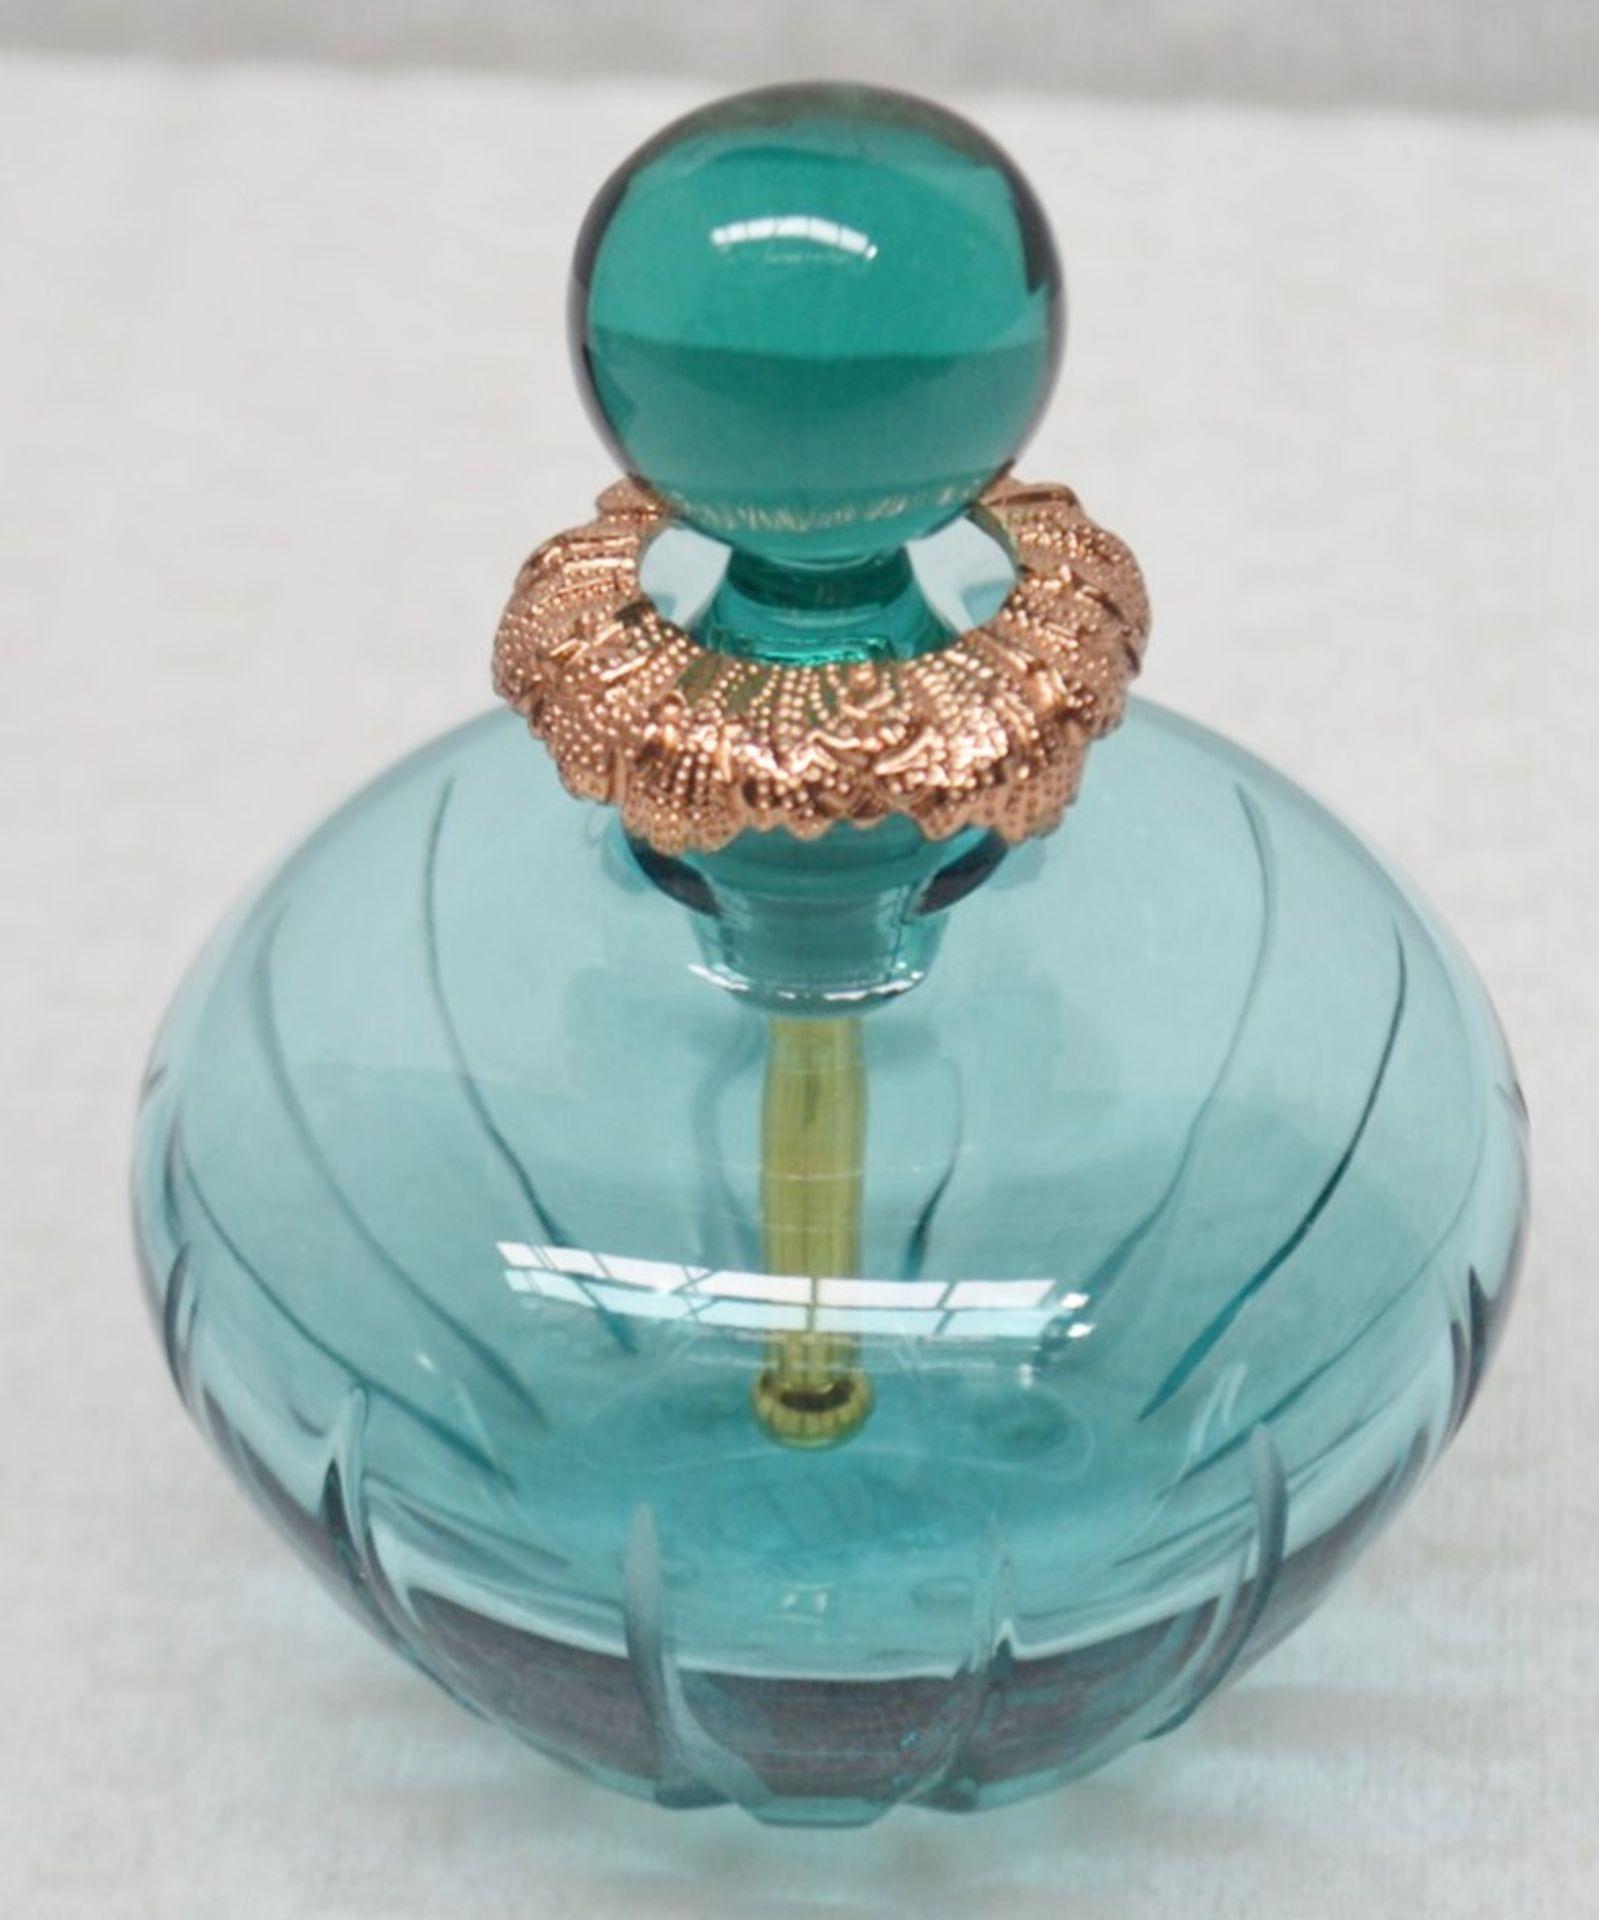 1 x BALDI 'Home Jewels' Italian Hand-crafted Artisan Ottanio Crystal Perfume Bottle & Stick -